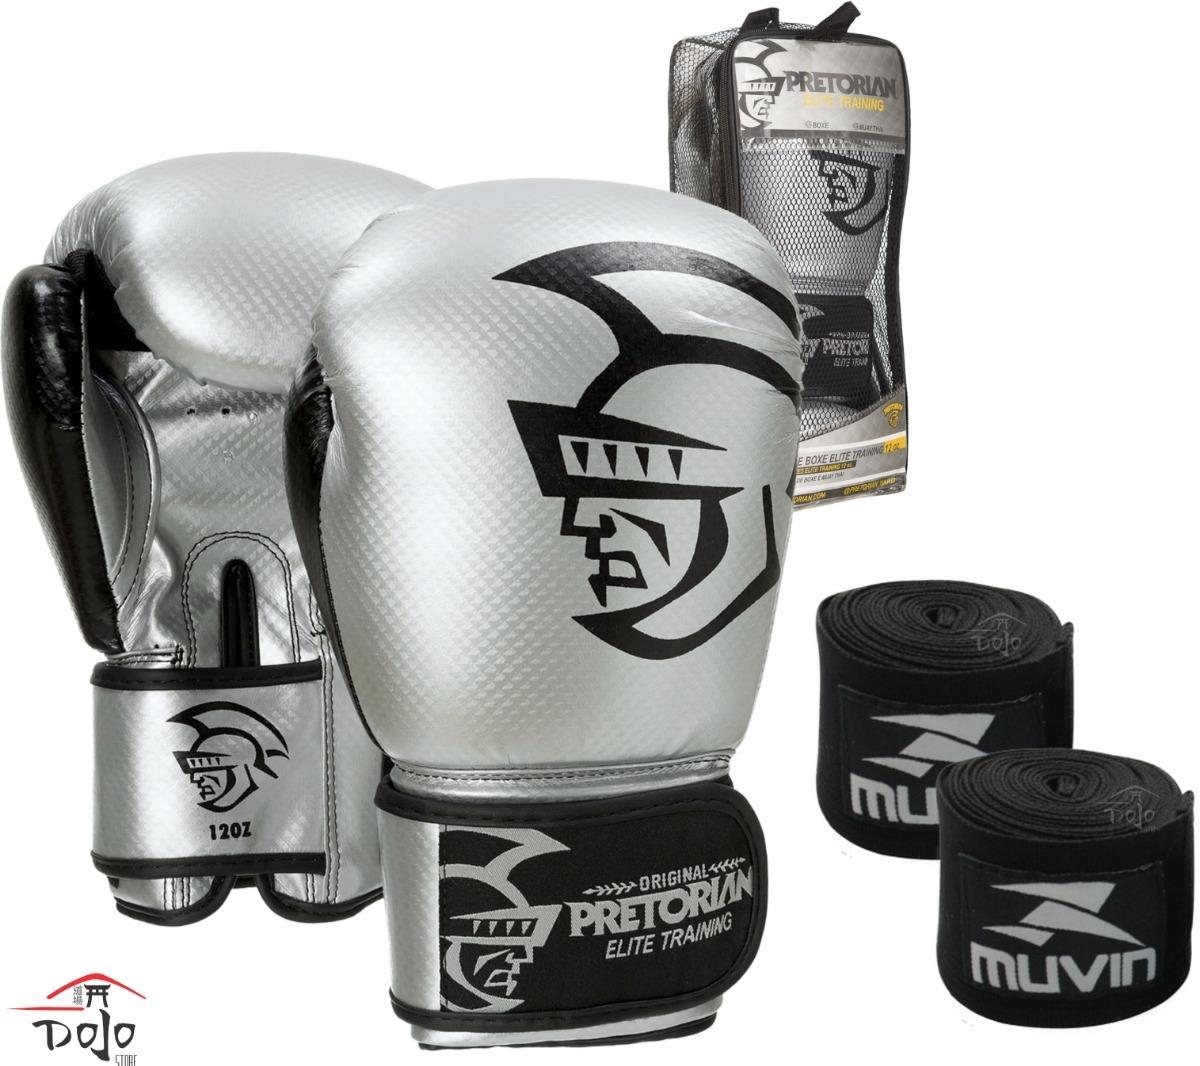 515ac72c8 kit luva boxe   muay thai pretorian elite prata + bandagem. Carregando zoom.